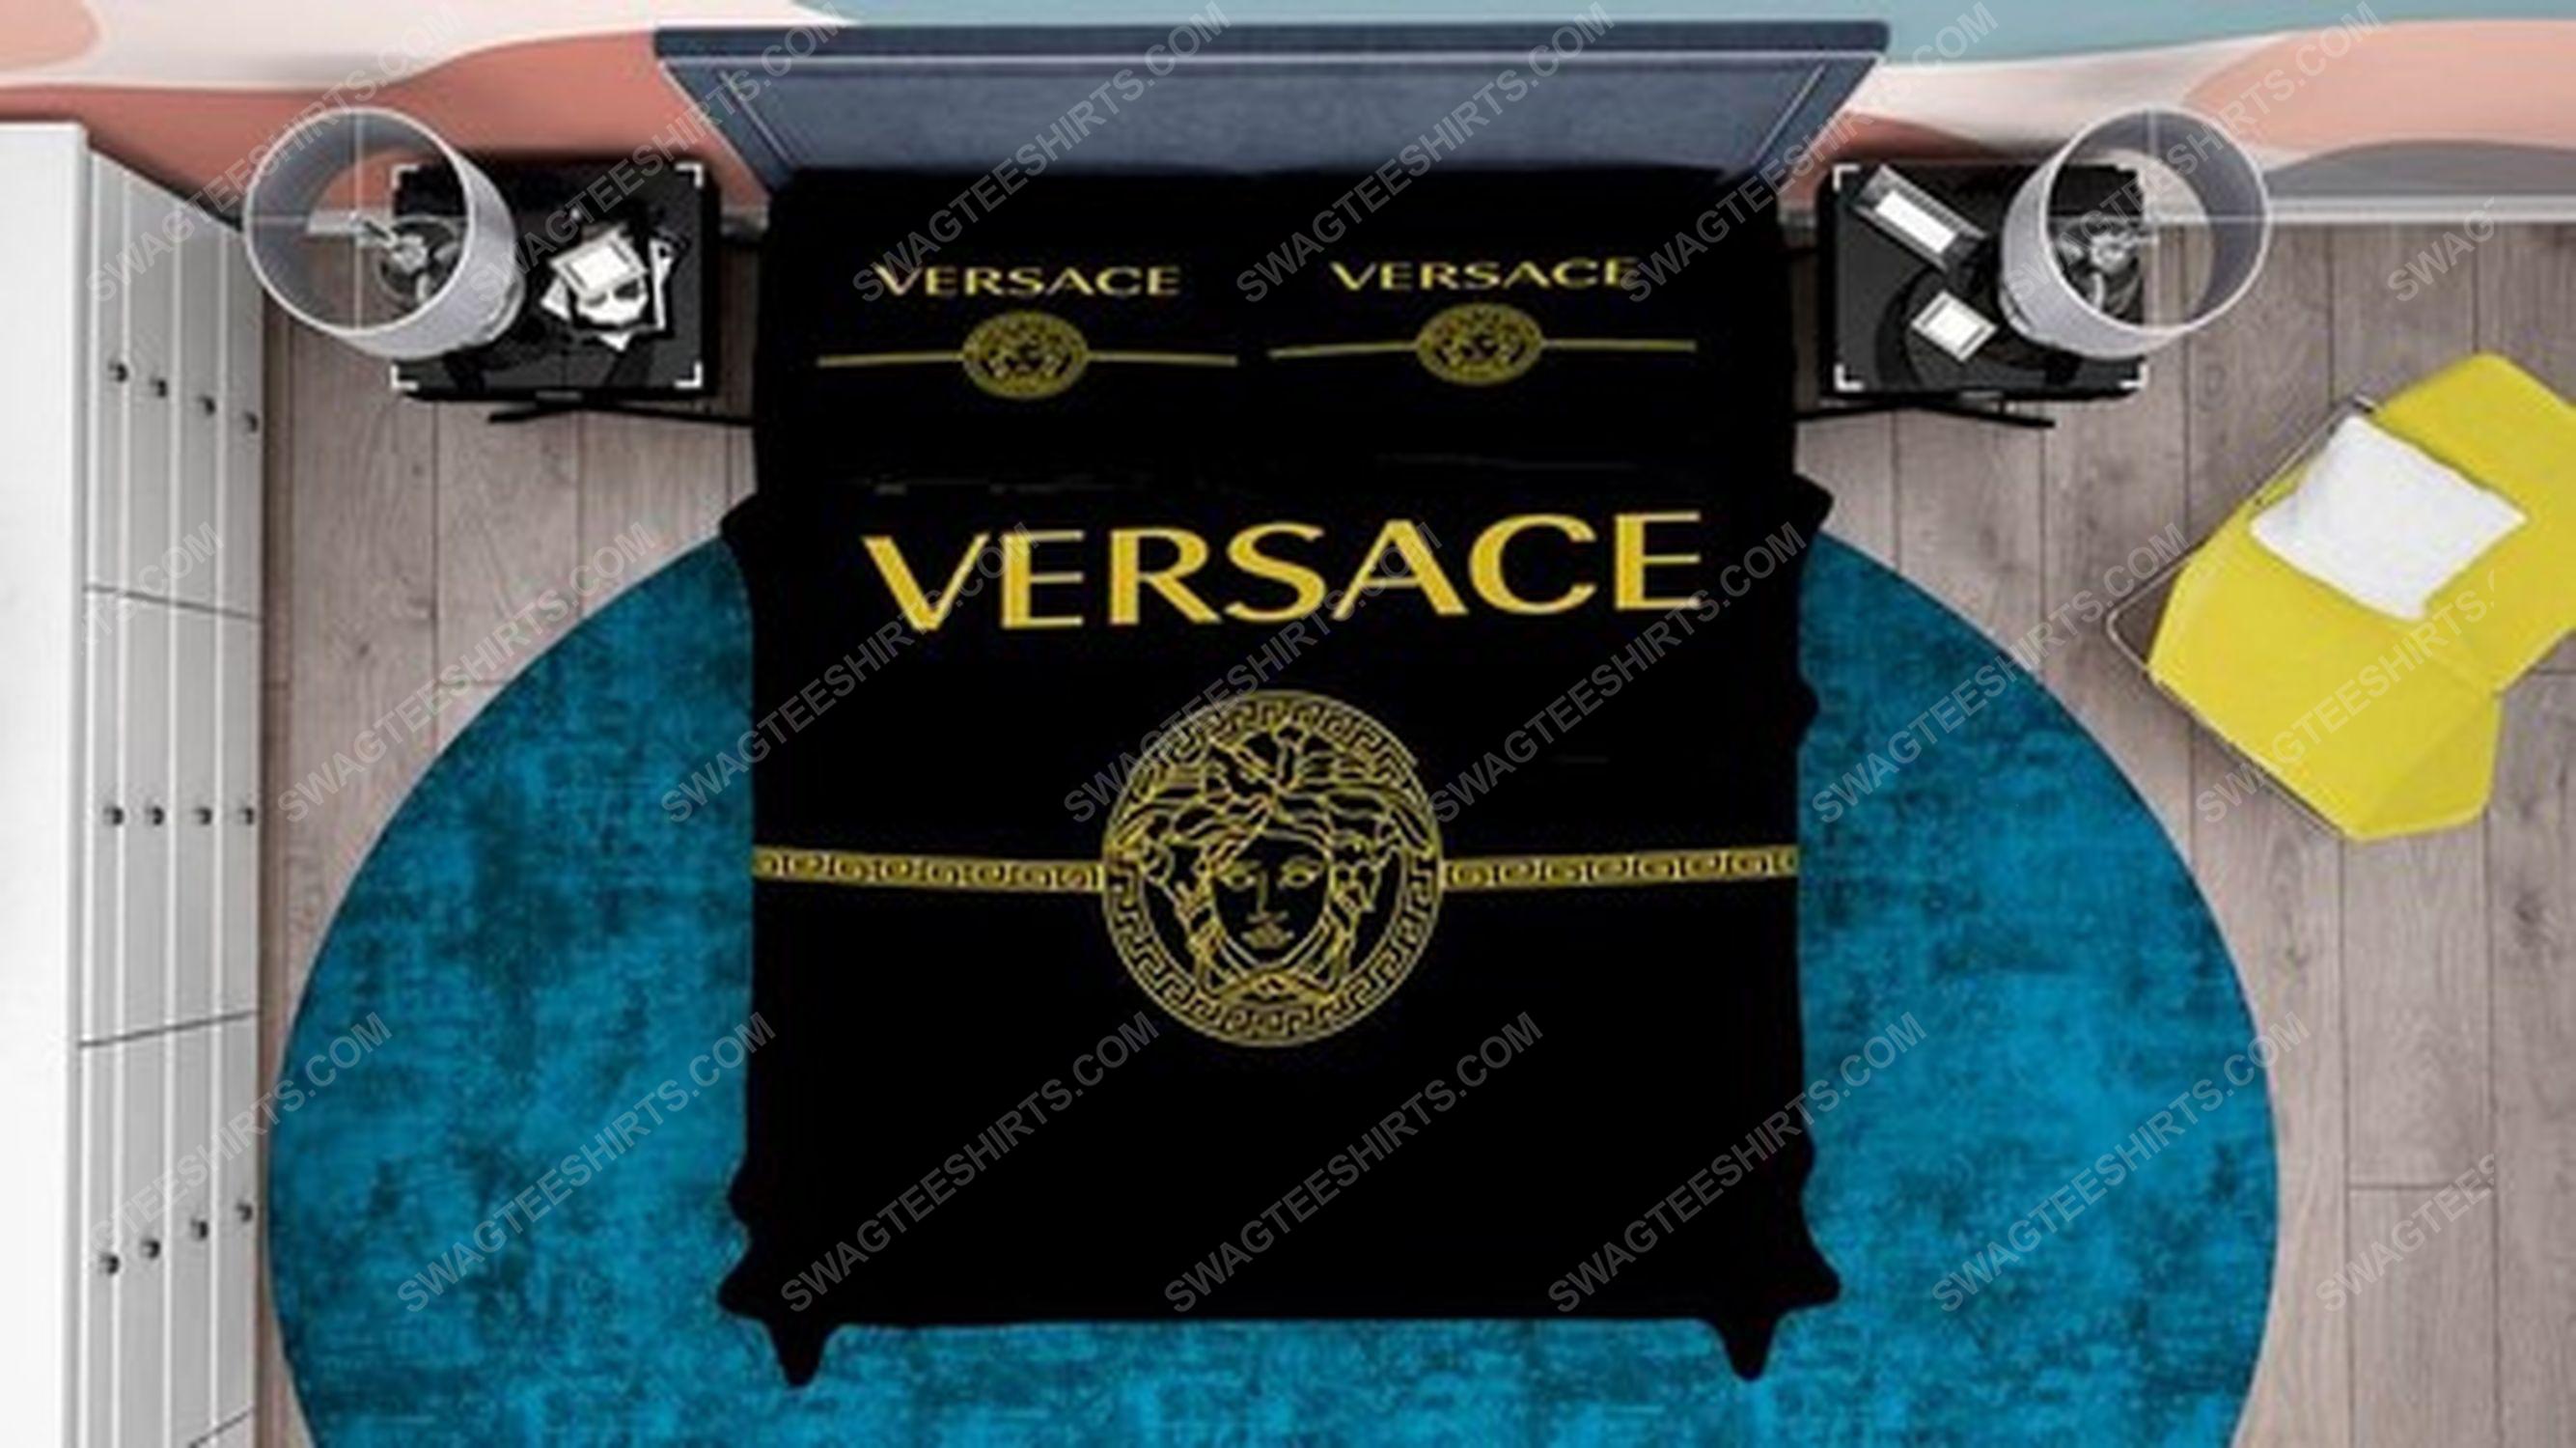 Versace black and gold full print duvet cover bedding set 3 - Copy